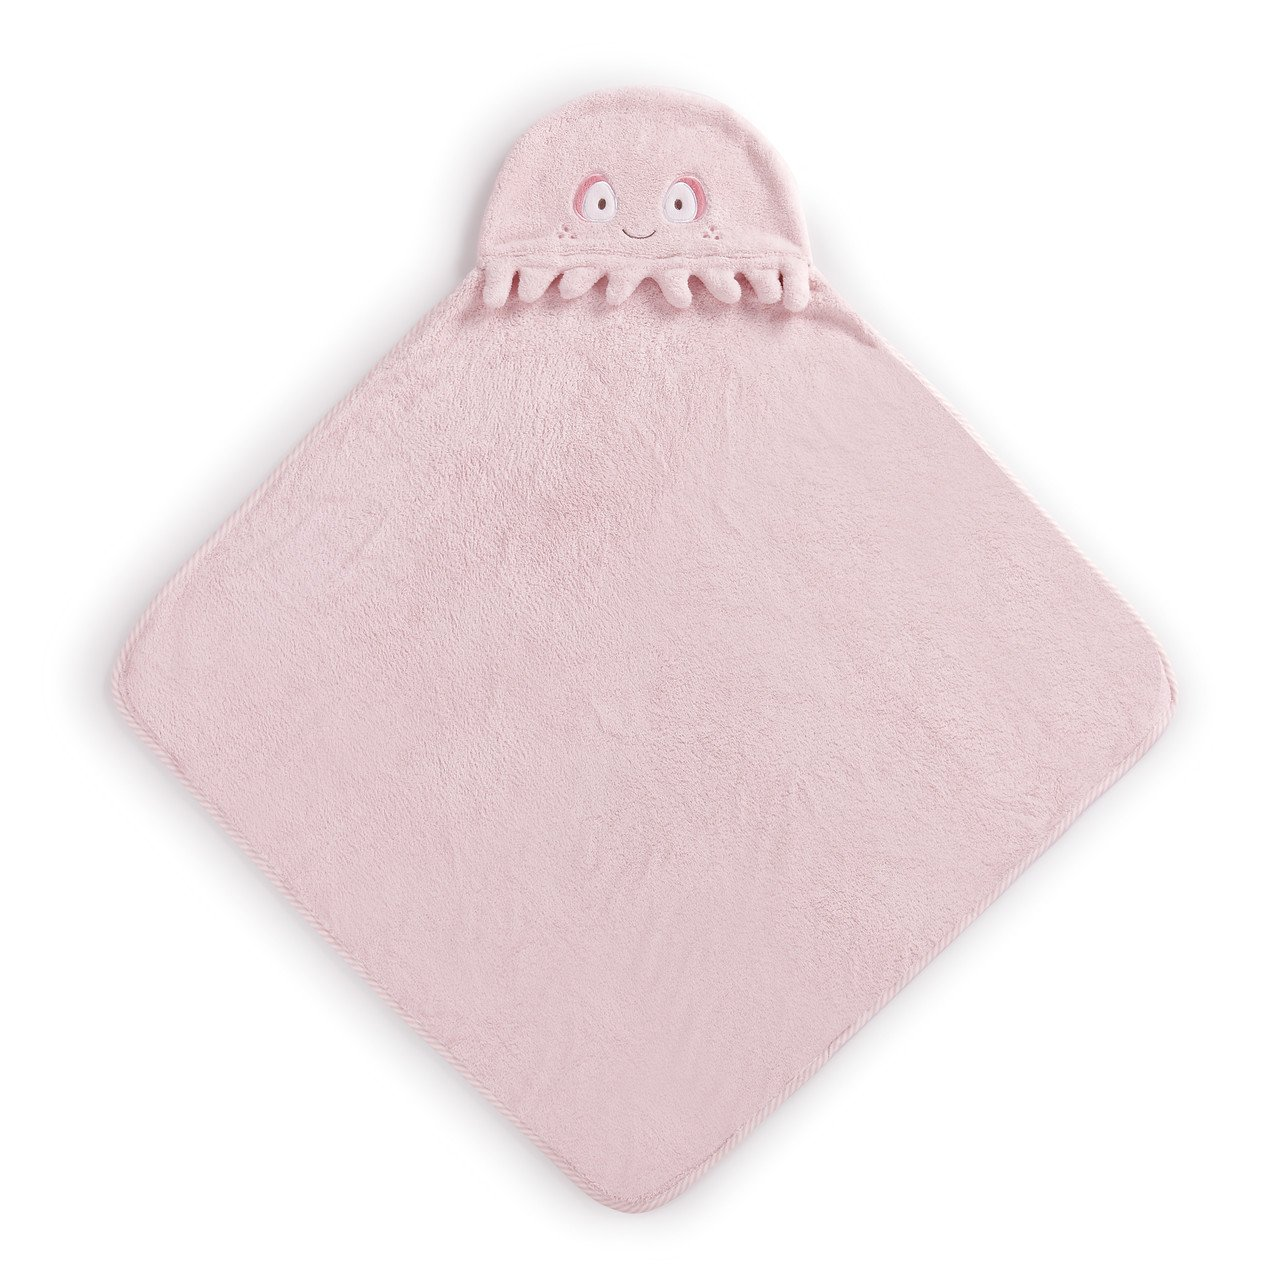 Demdaco Baby Hooded Bath Towel, Octopus